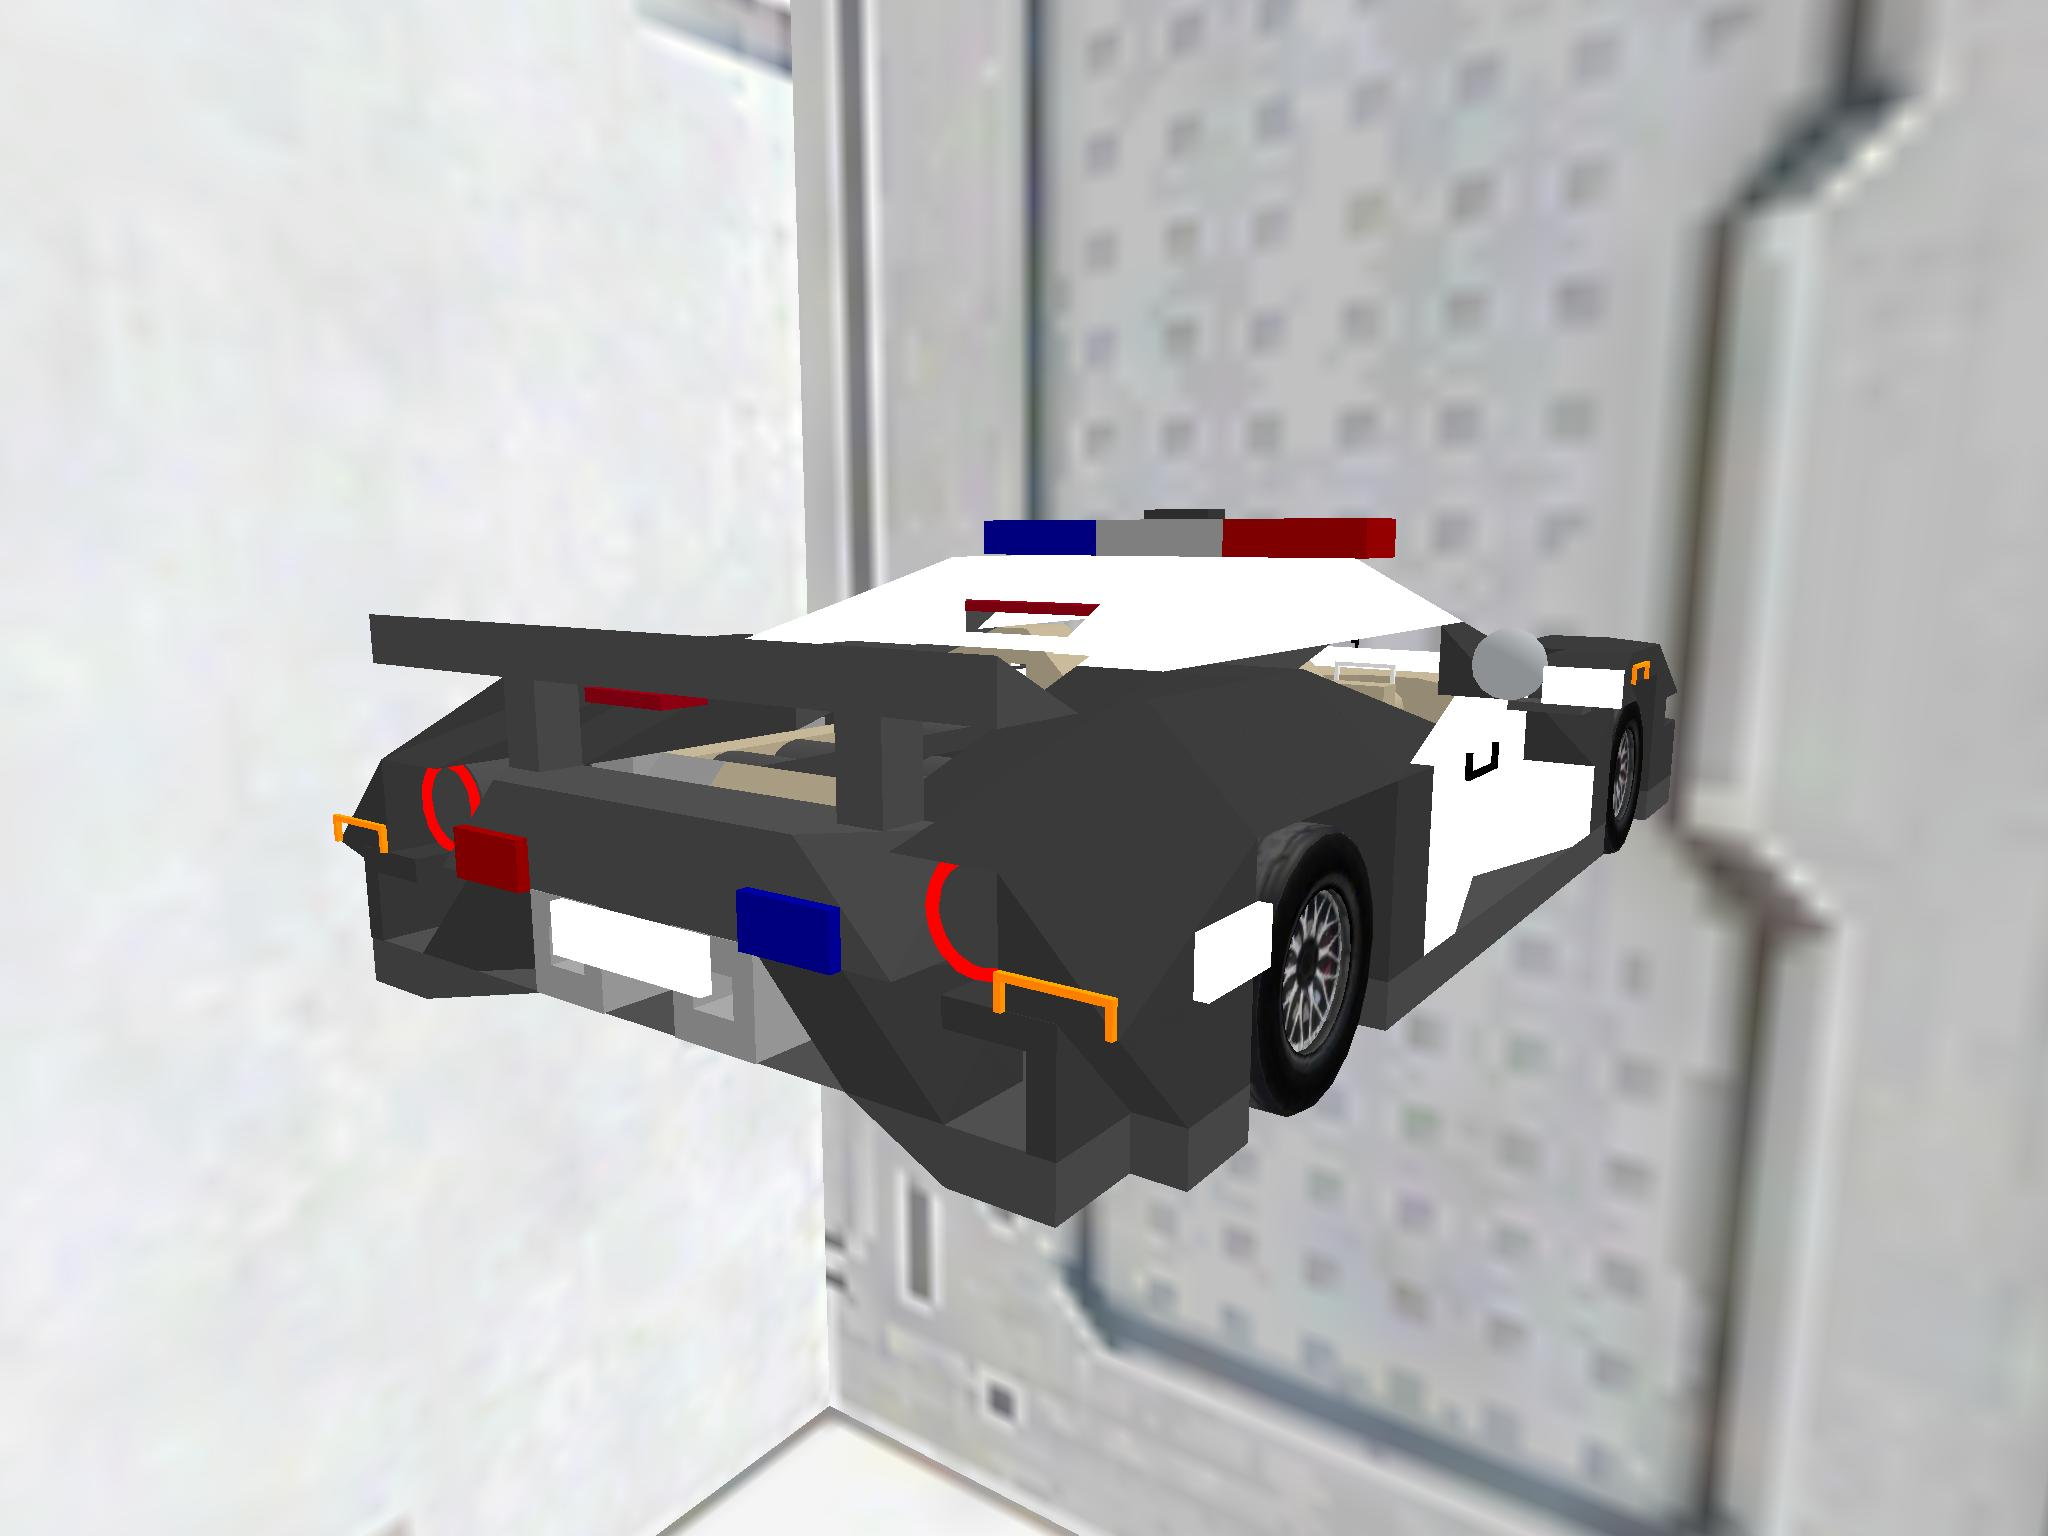 Ln-620 POLICE INTERCEPTOR